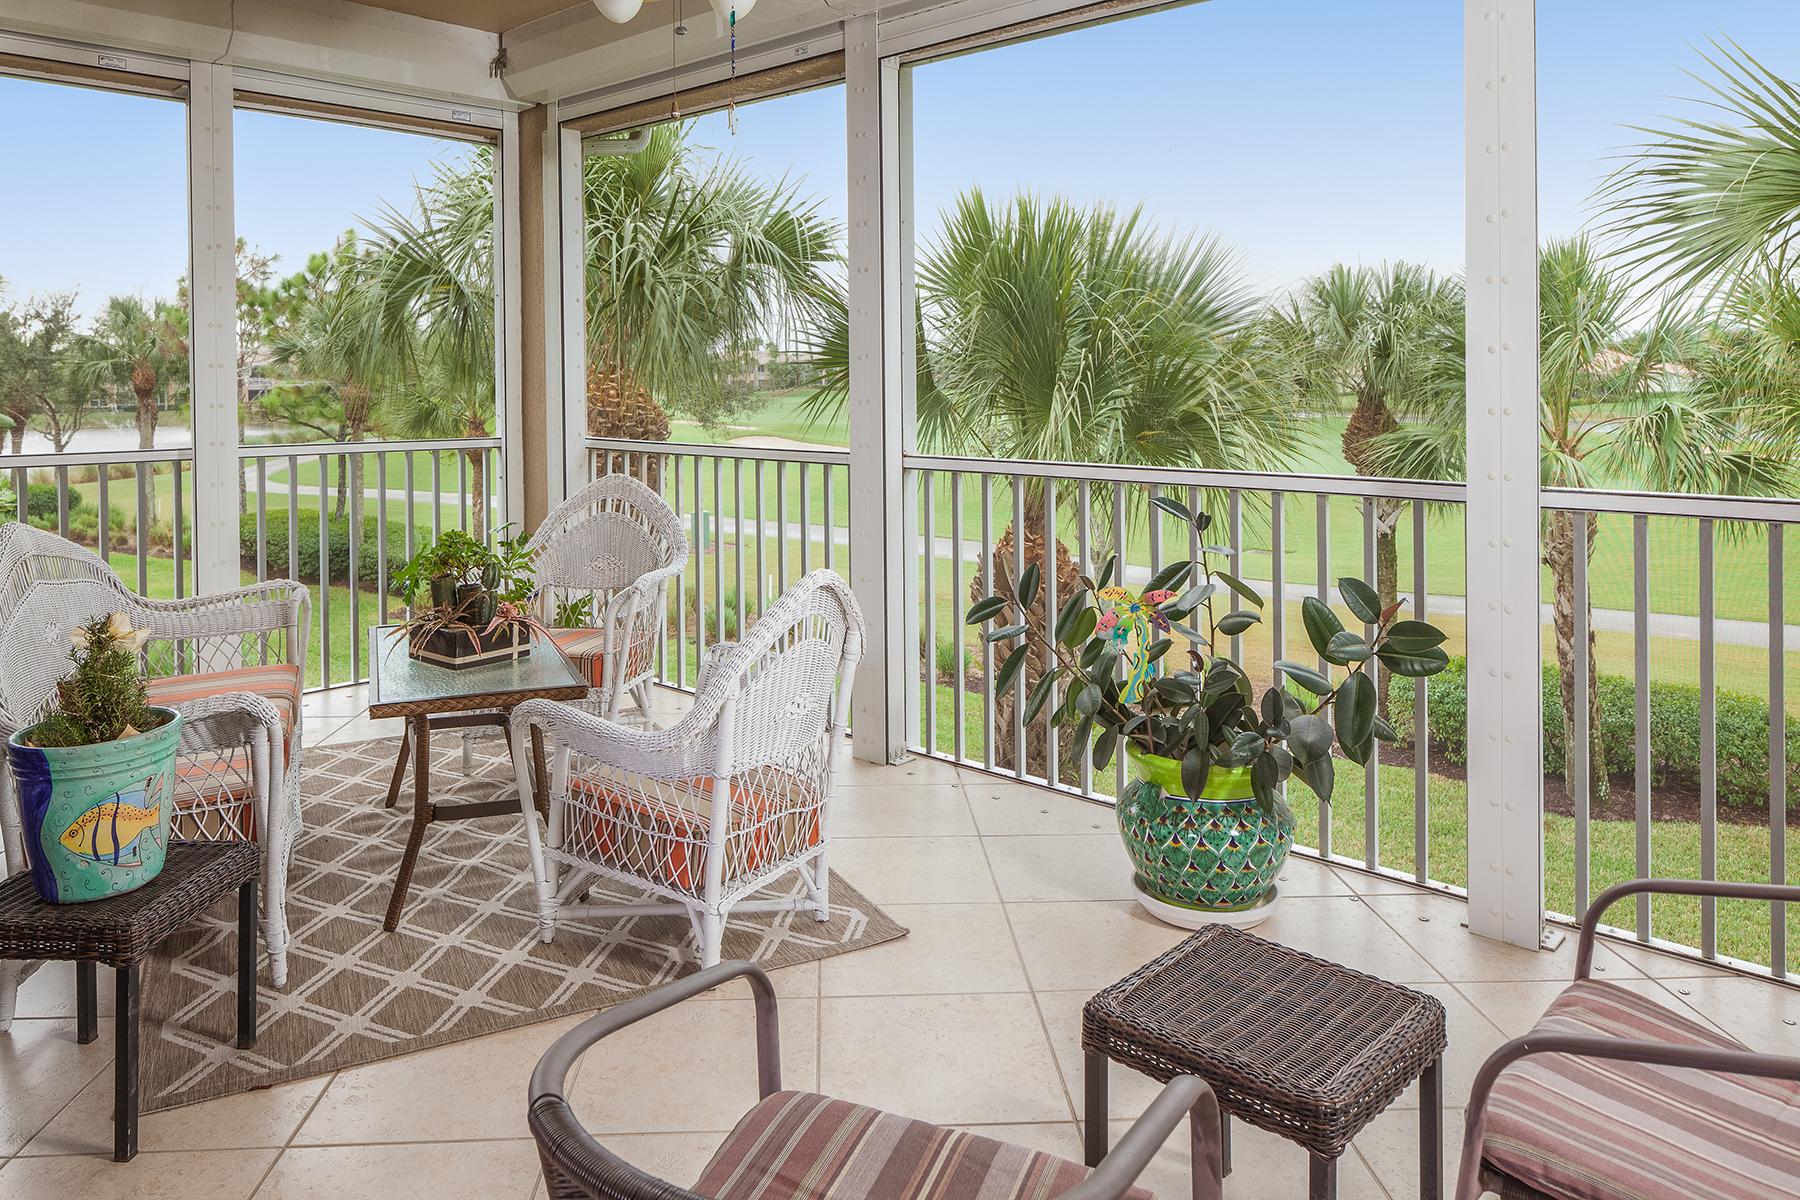 Condominium for Sale at SHADOW WOOD AT THE BROOKS - OAK HAMMOCK 11 10442 Autumn Breeze Dr 201 Estero, Florida, 34135 United States